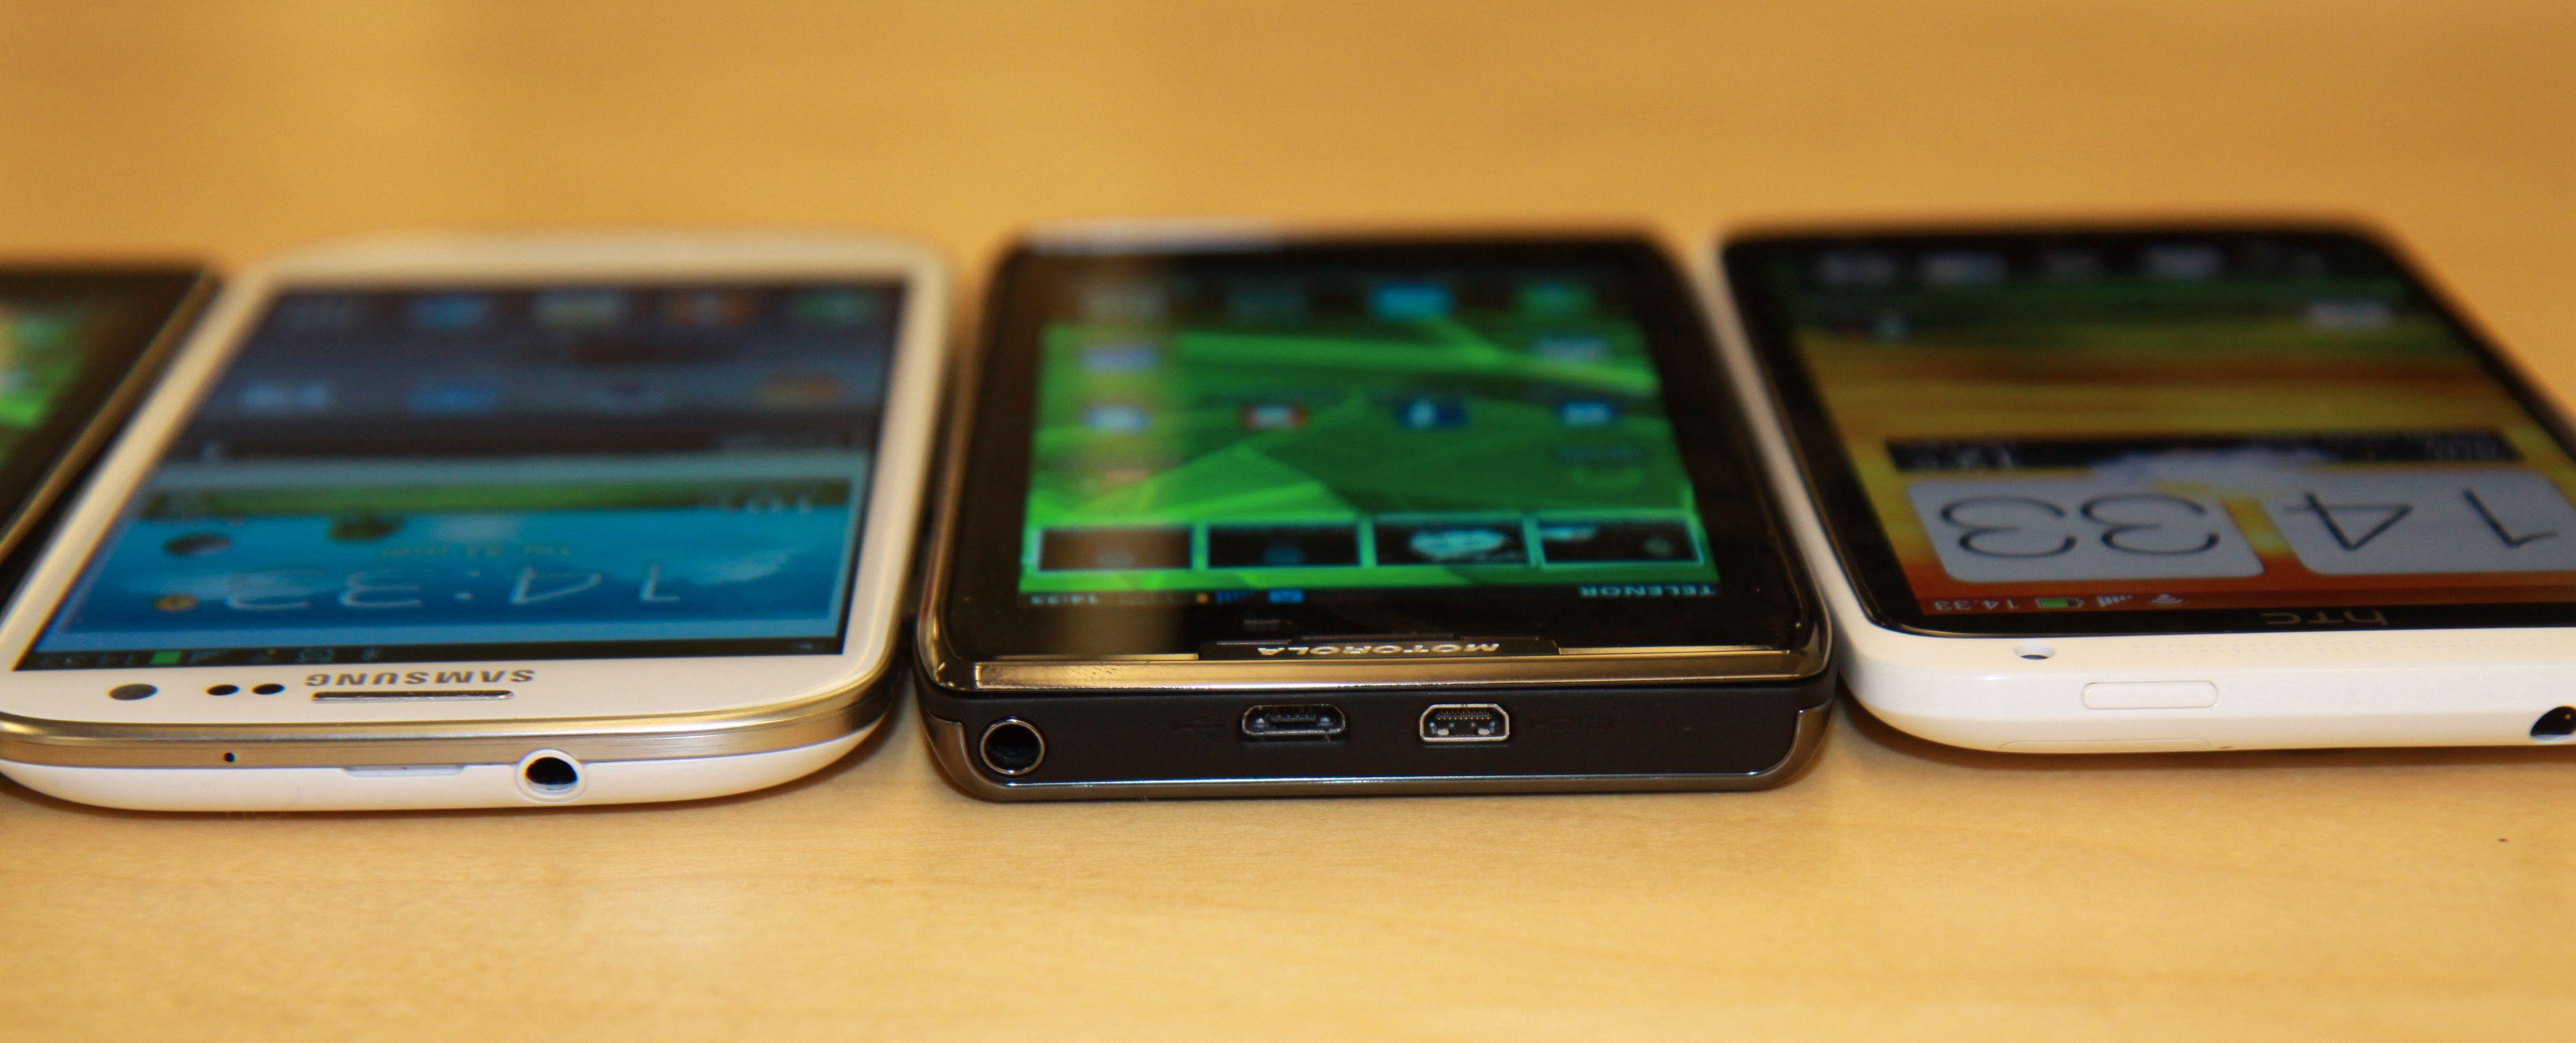 Fra venstre; Samsung Galaxy S III, Motorola Razr Maxx og HTC One X.